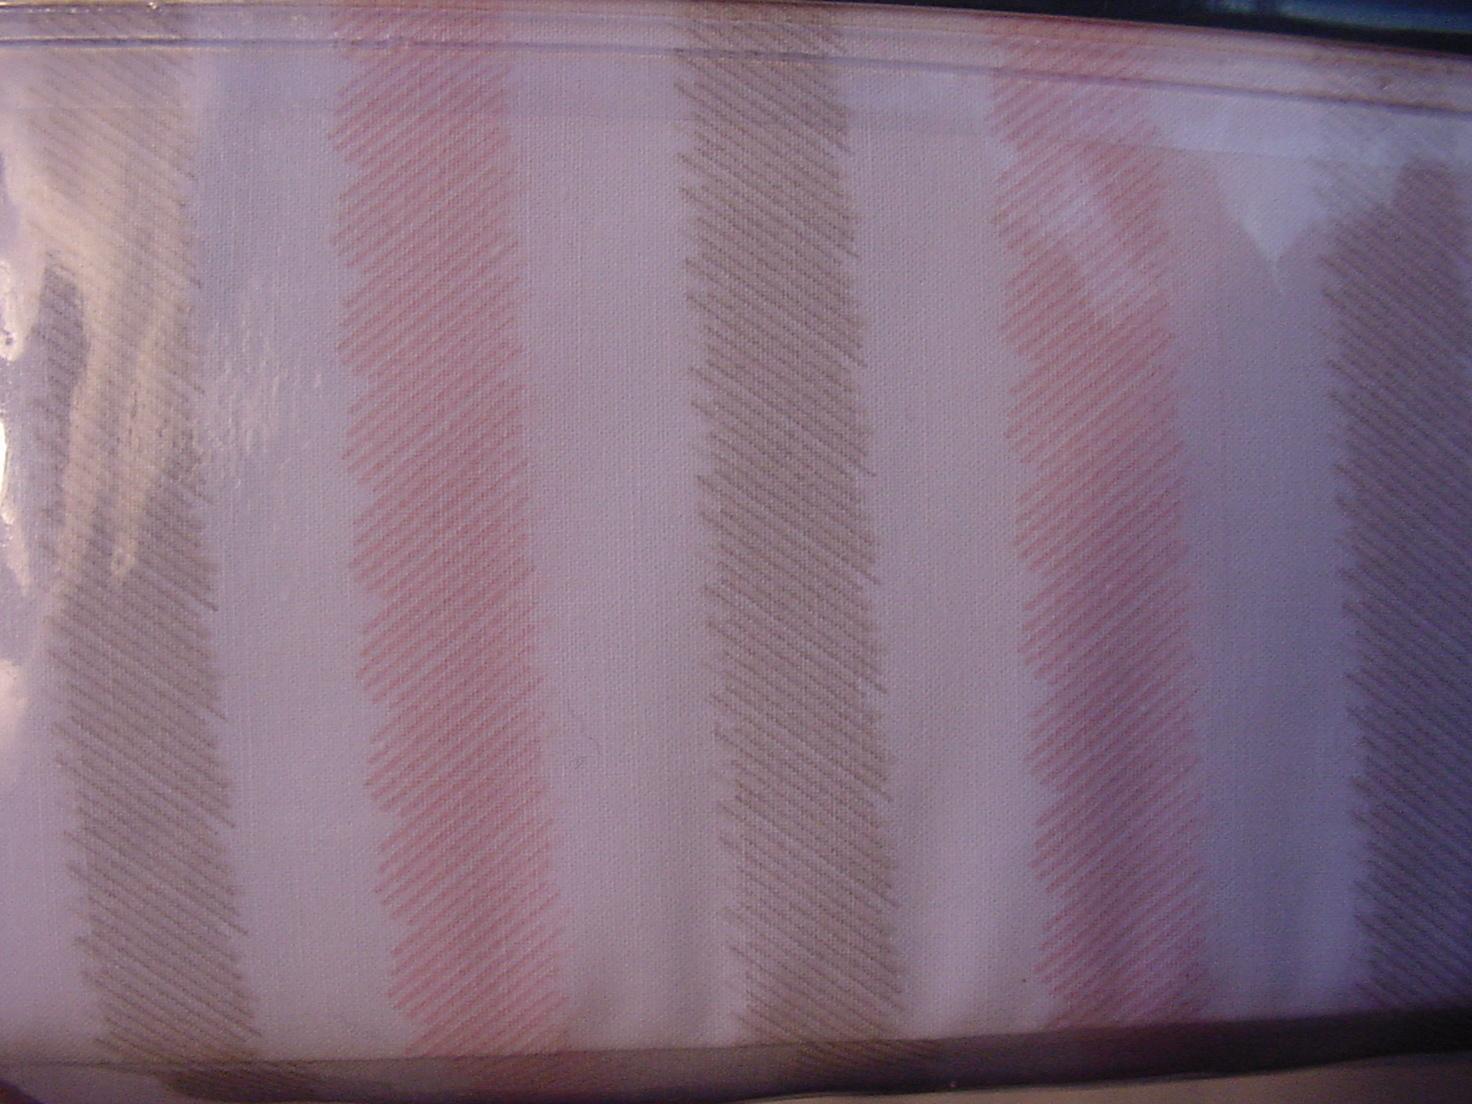 Ralph Lauren Pink and Beige fuzzy Edge Stripes on White Sheet Set Queen